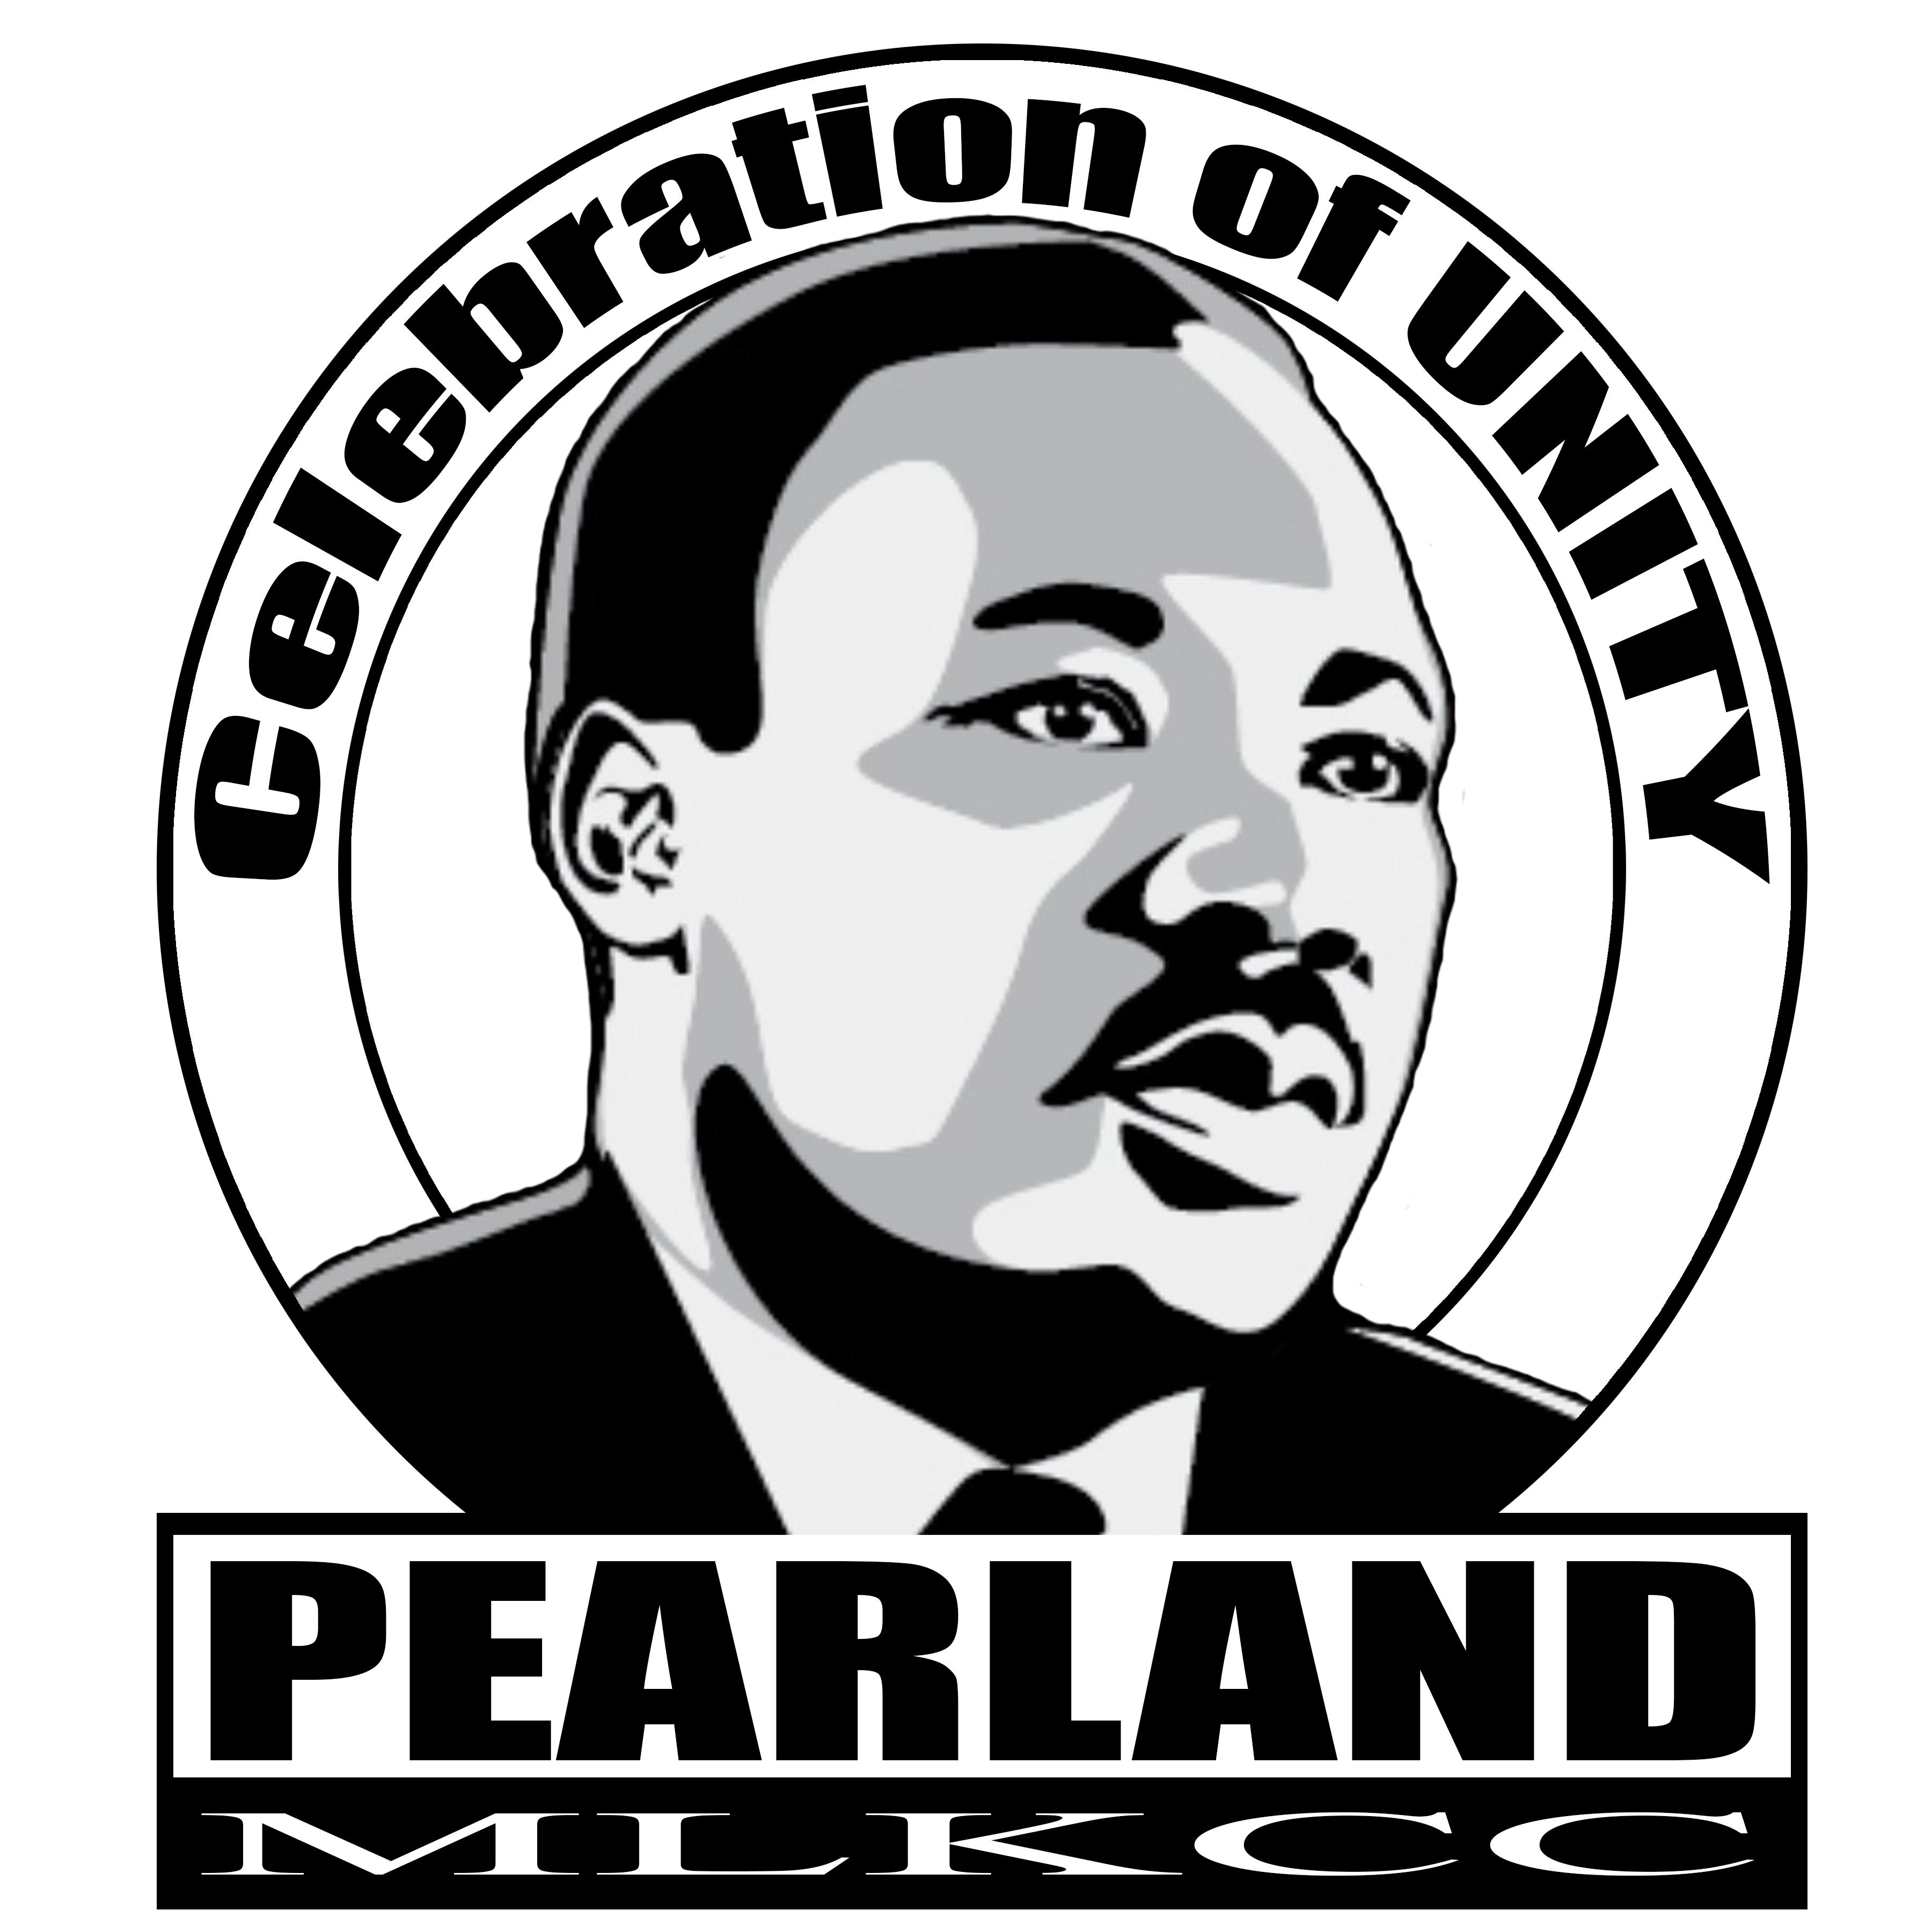 Pearland_MLKCC_Logo.jpg